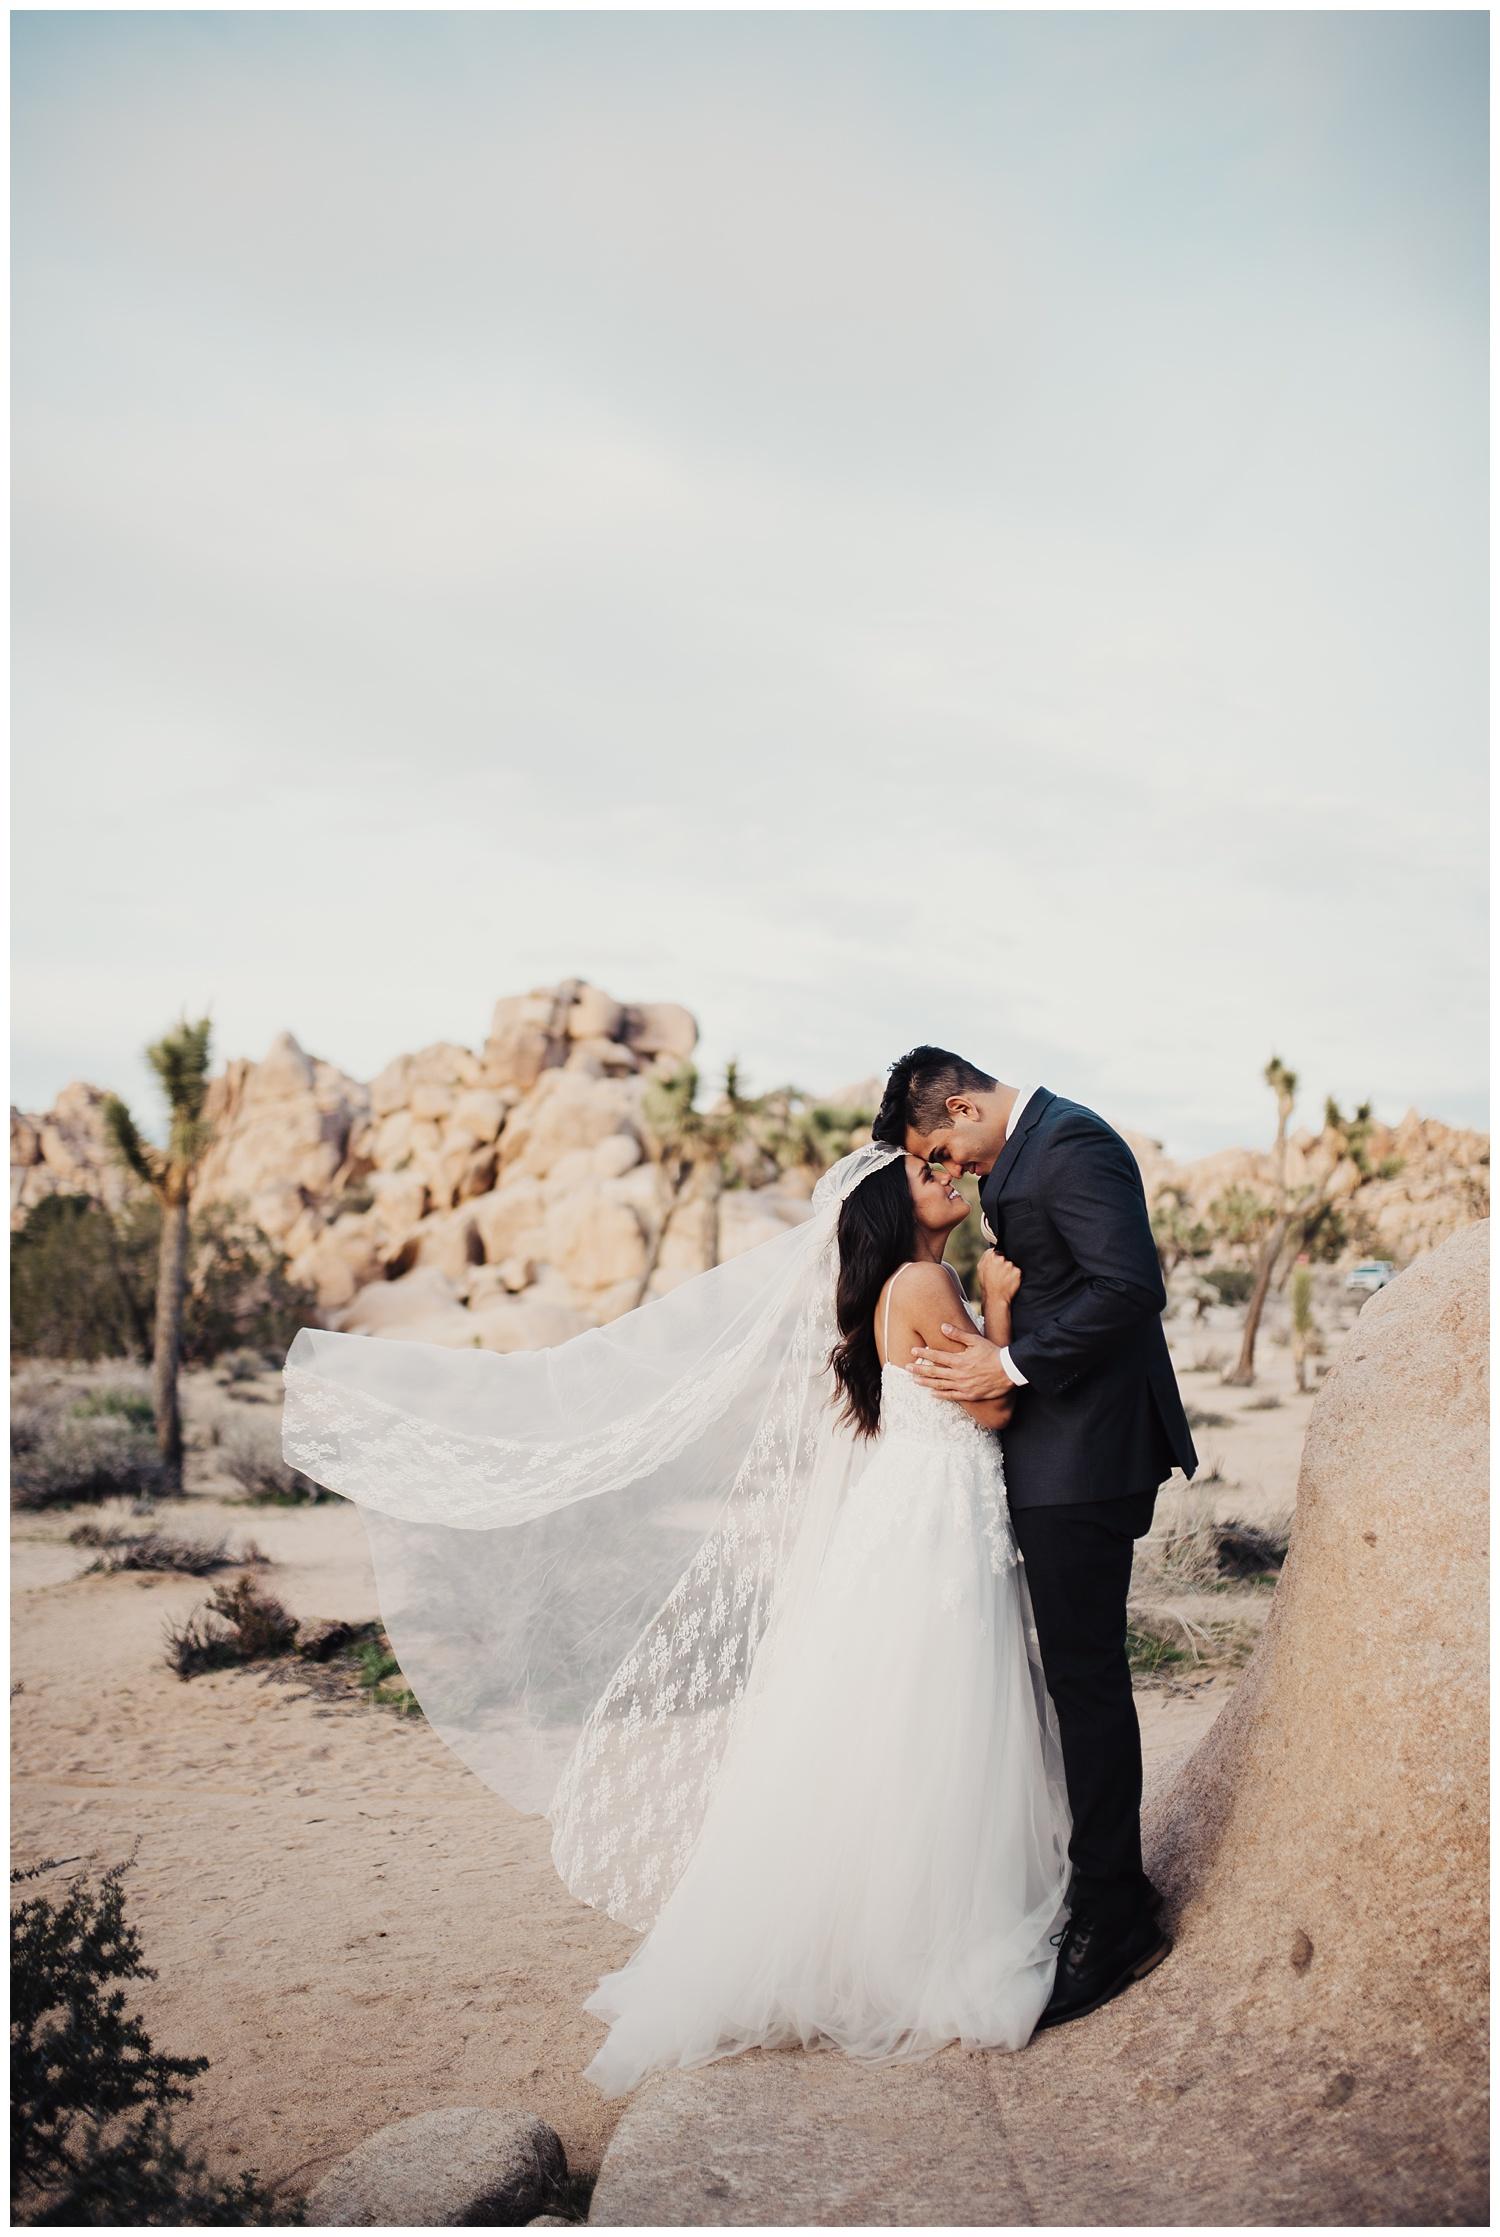 edenstraderphoto-weddingphotographer_0417.jpg